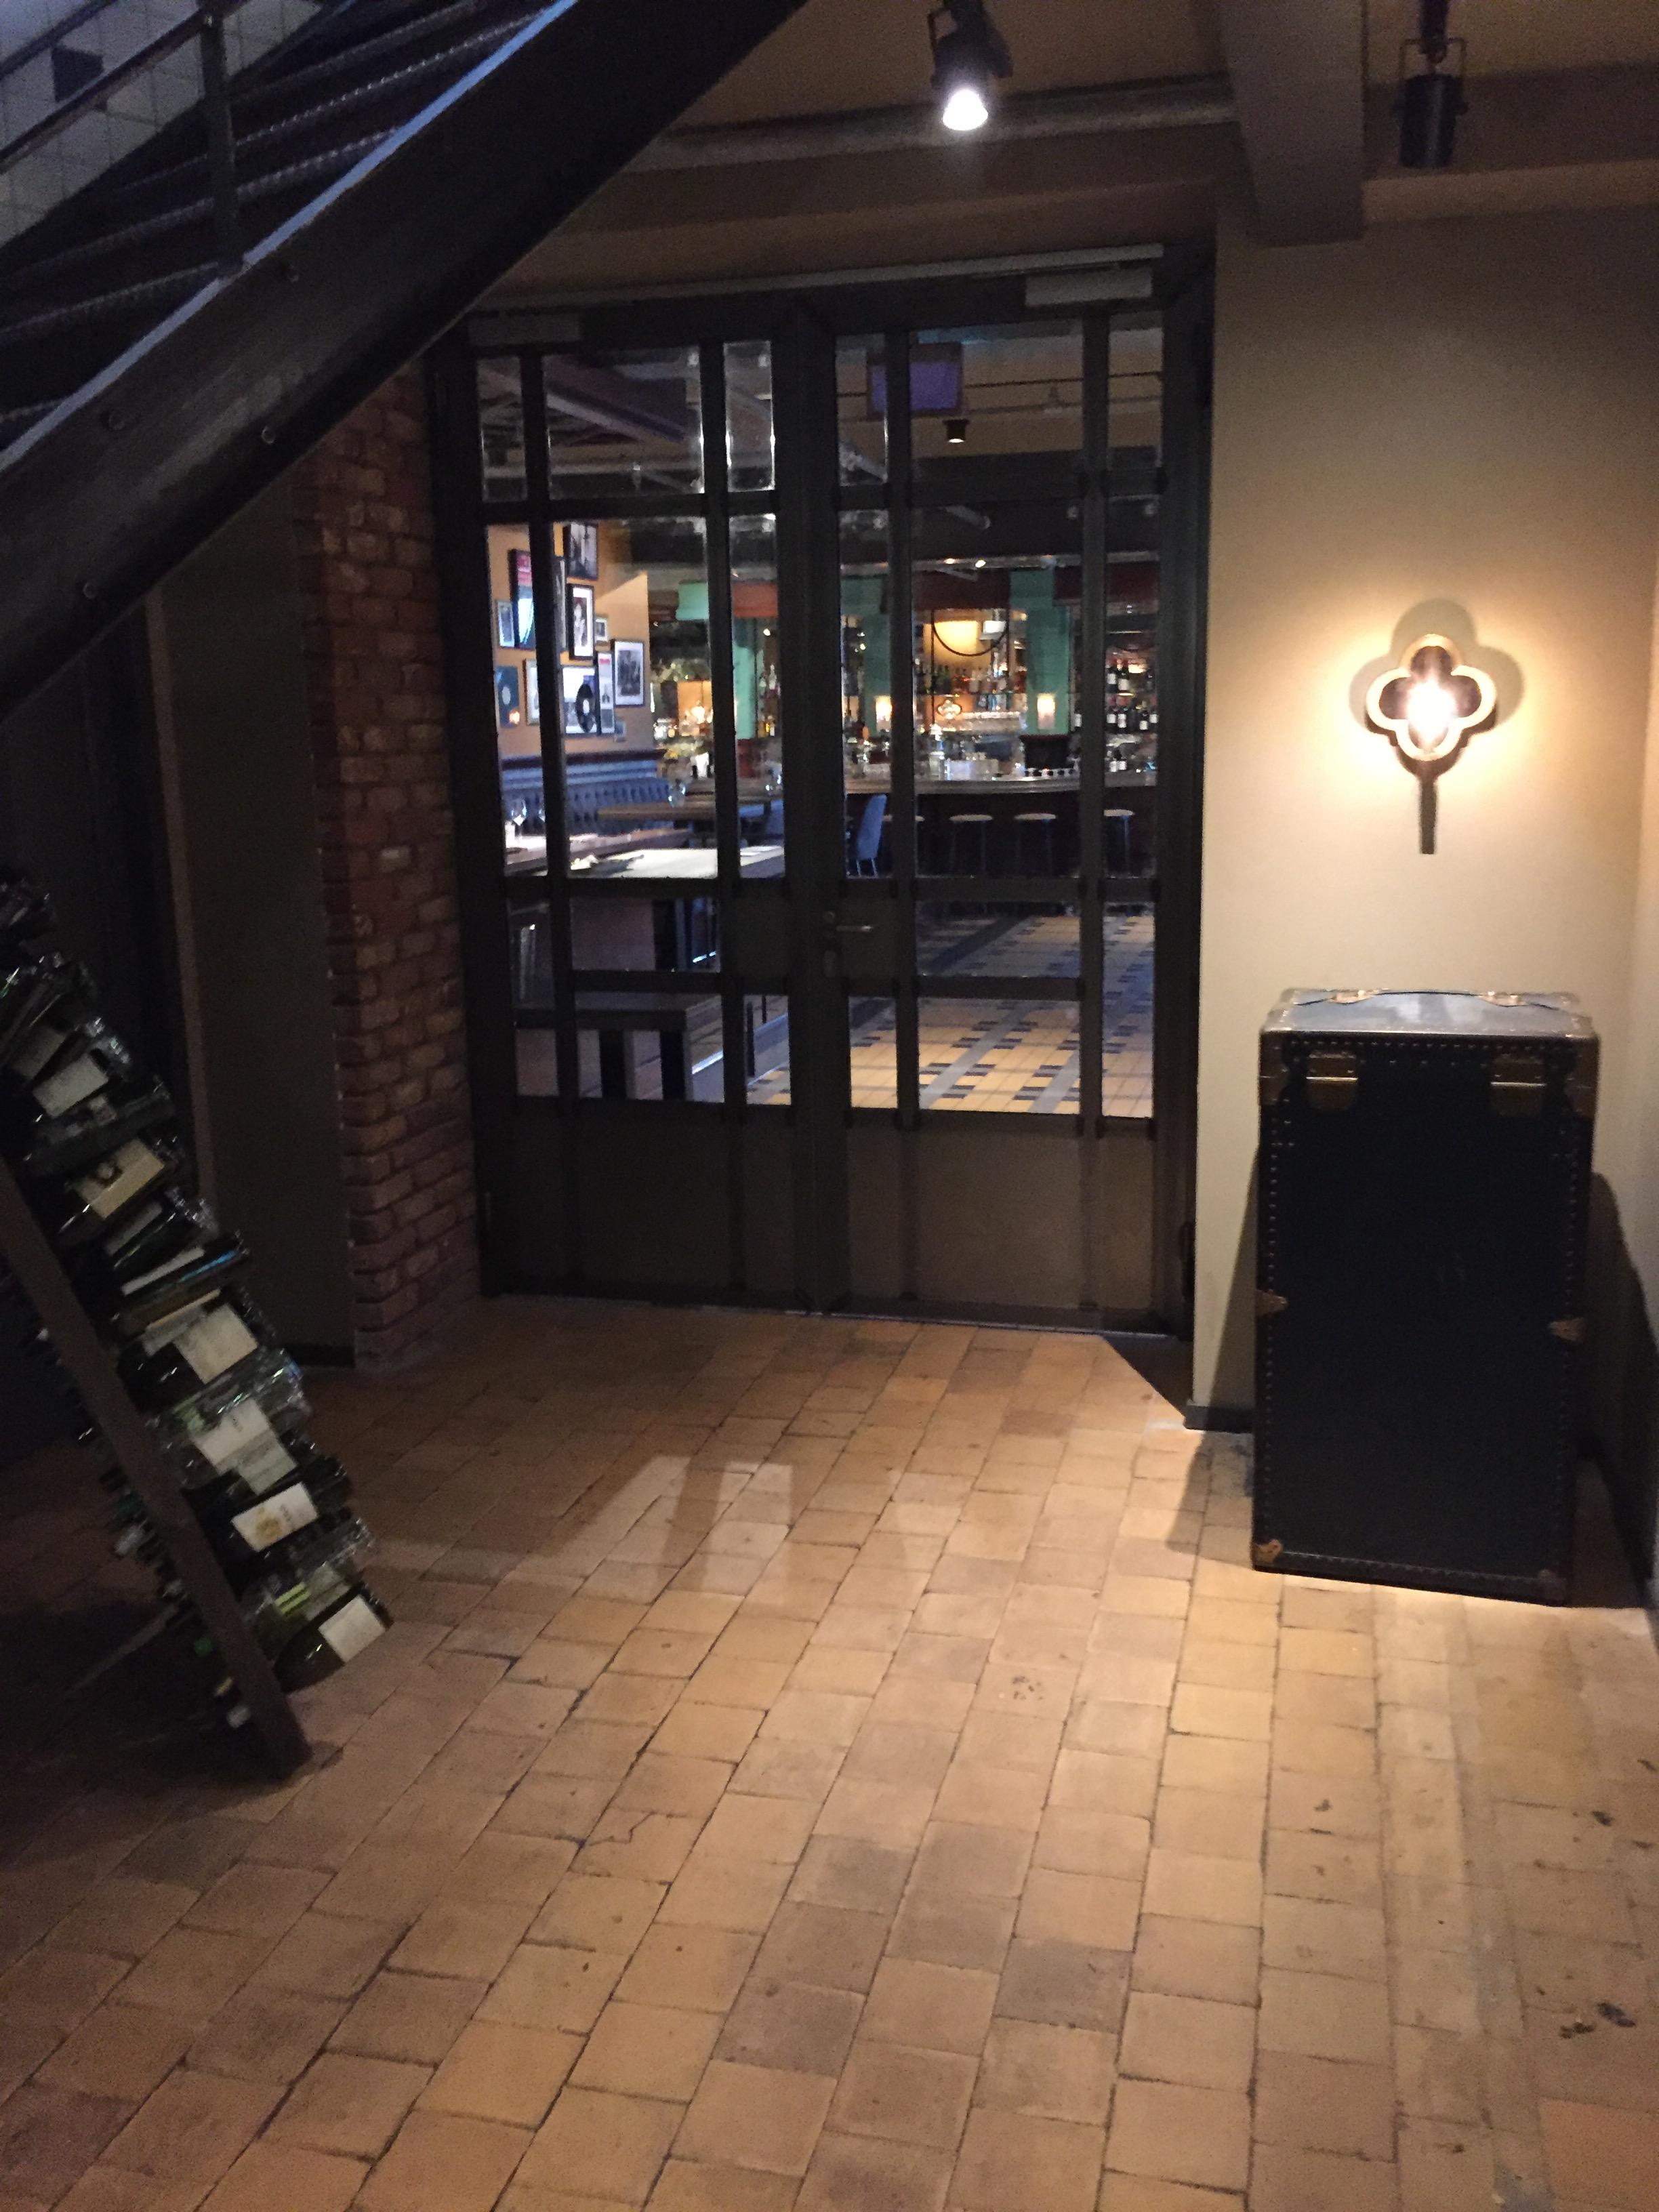 Staal verwerkt in interieur hotel new york zador - Decoration interieur new york ...